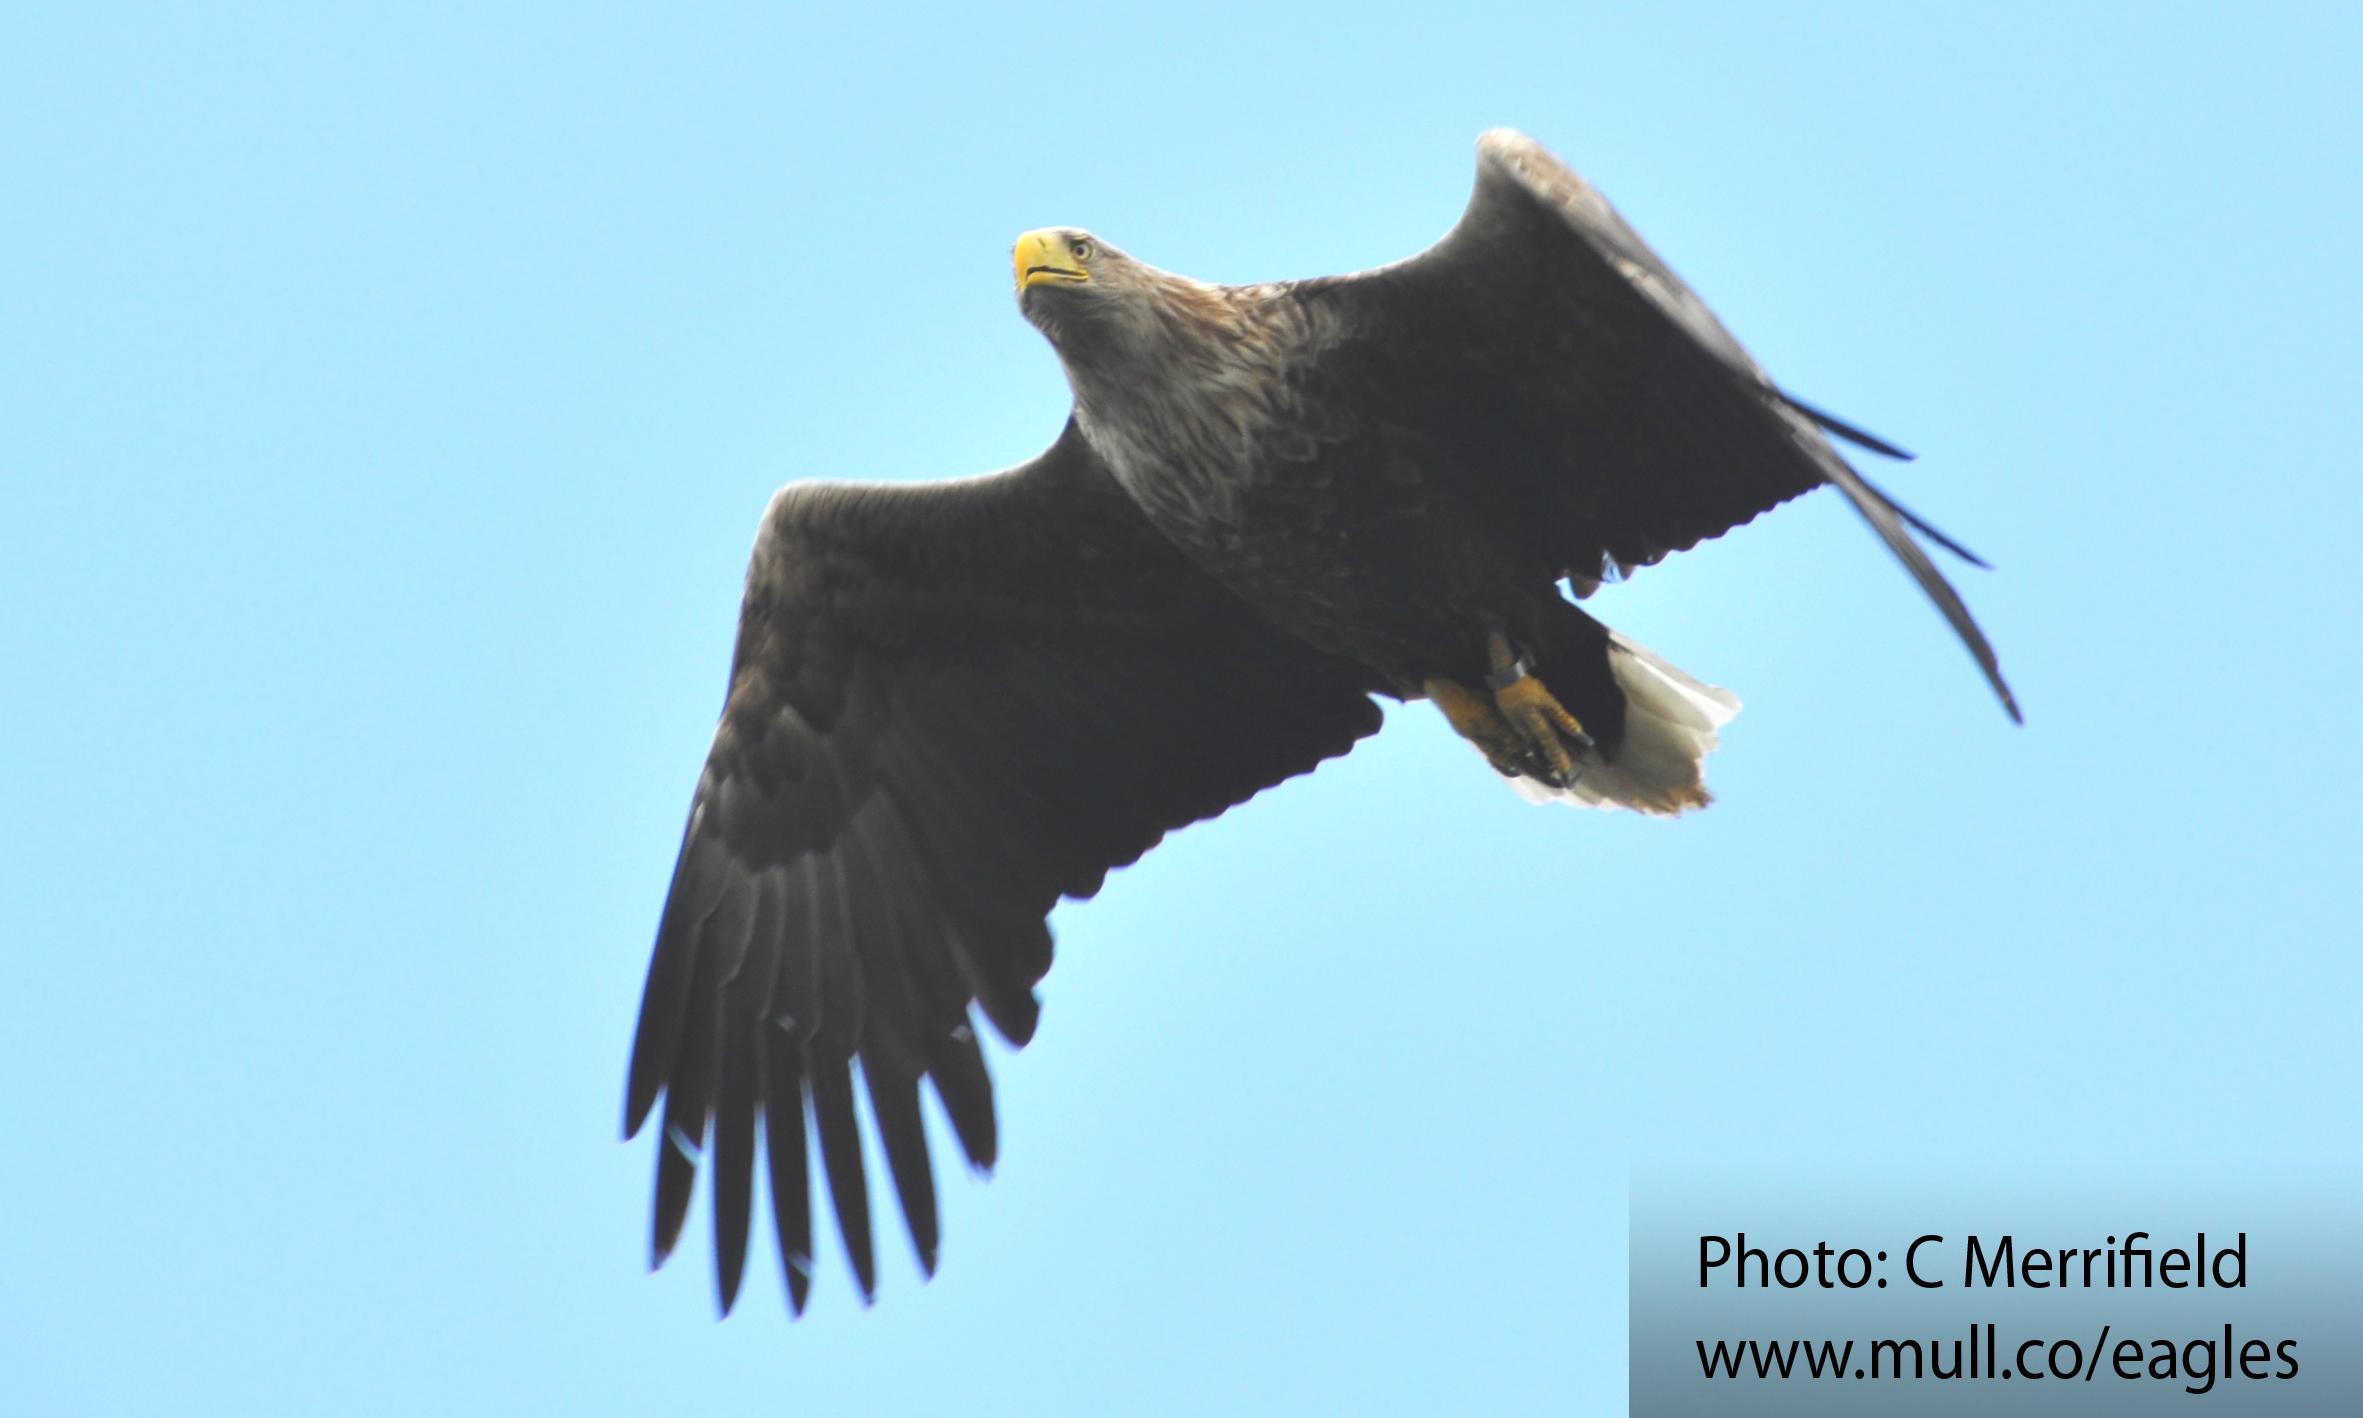 Mull sea eagle in flight